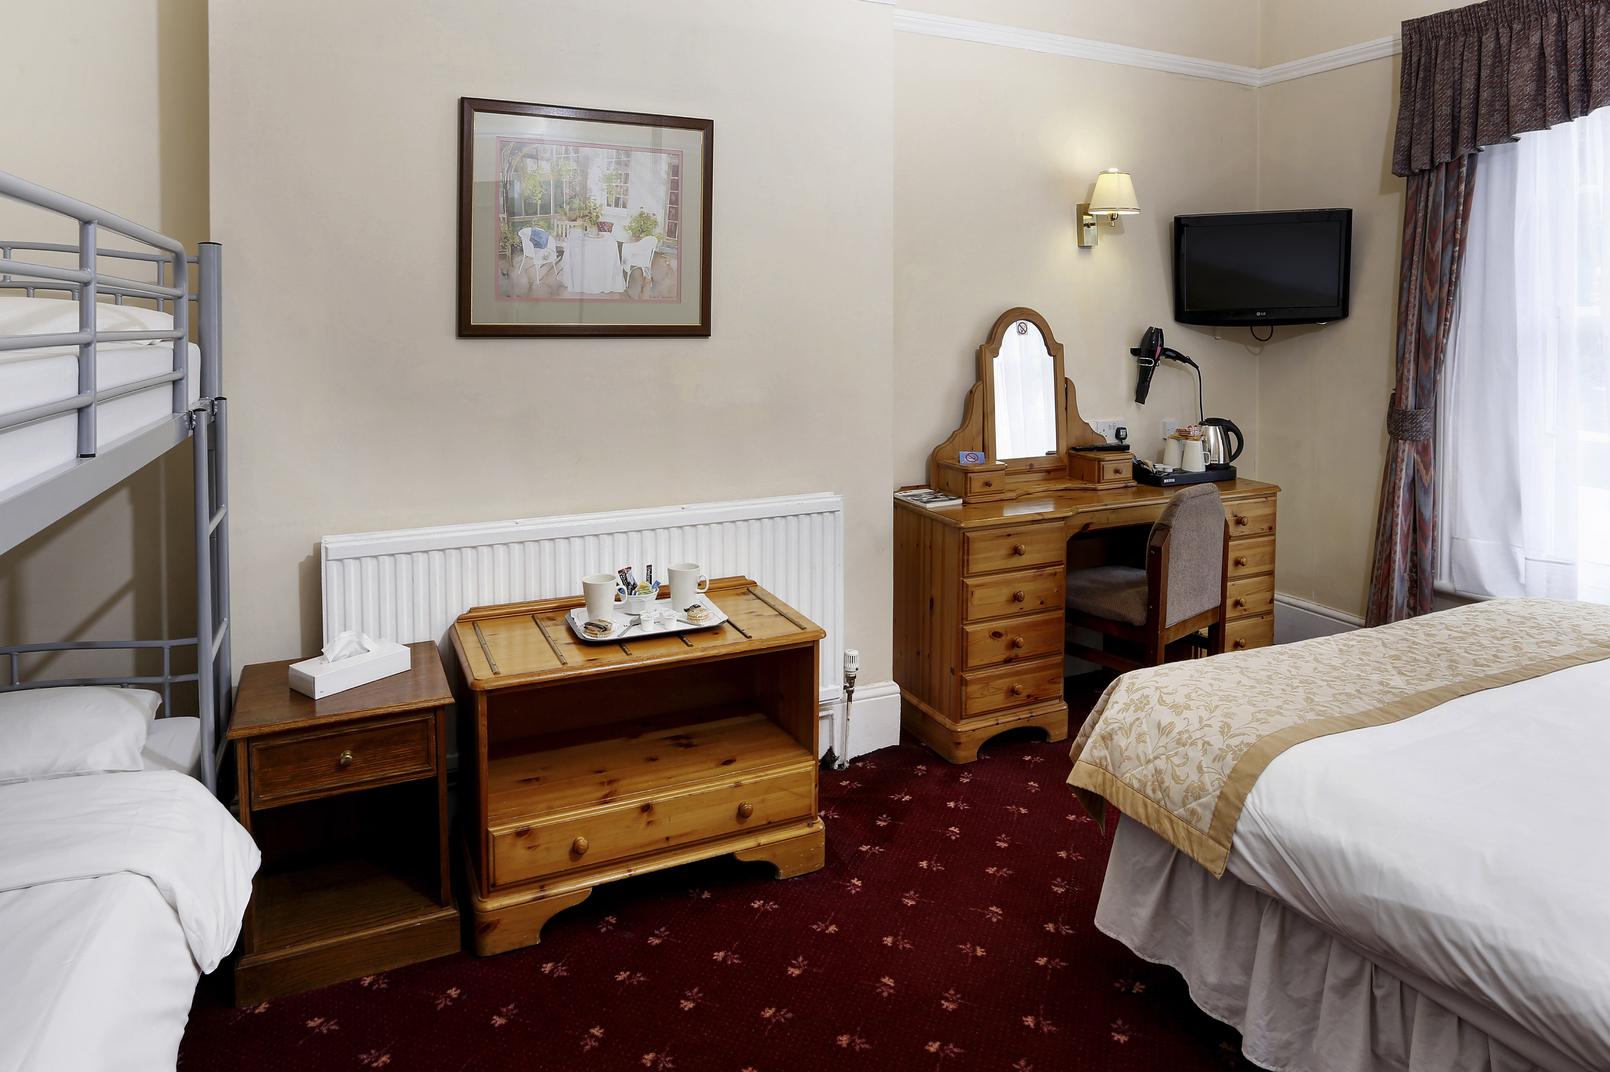 Surrey Hotel Number Of Rooms